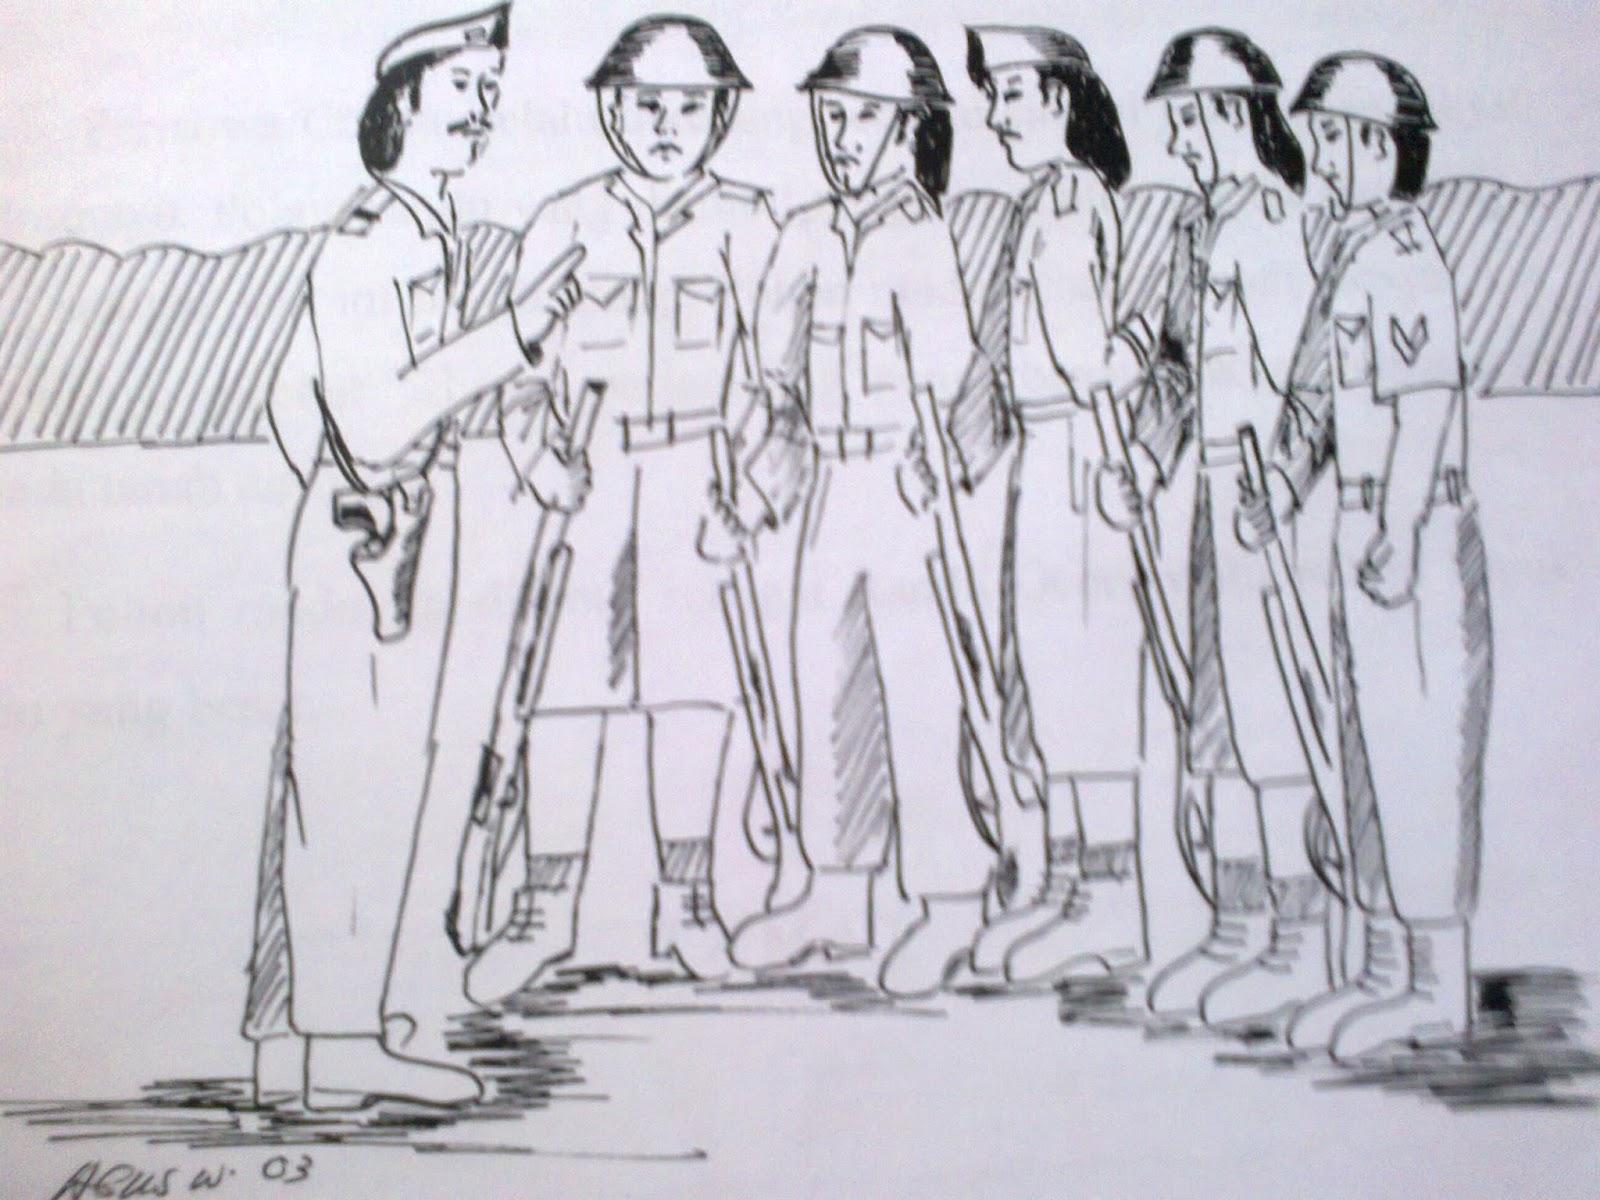 54 Gambar Karikatur Tema Pahlawan Karitur